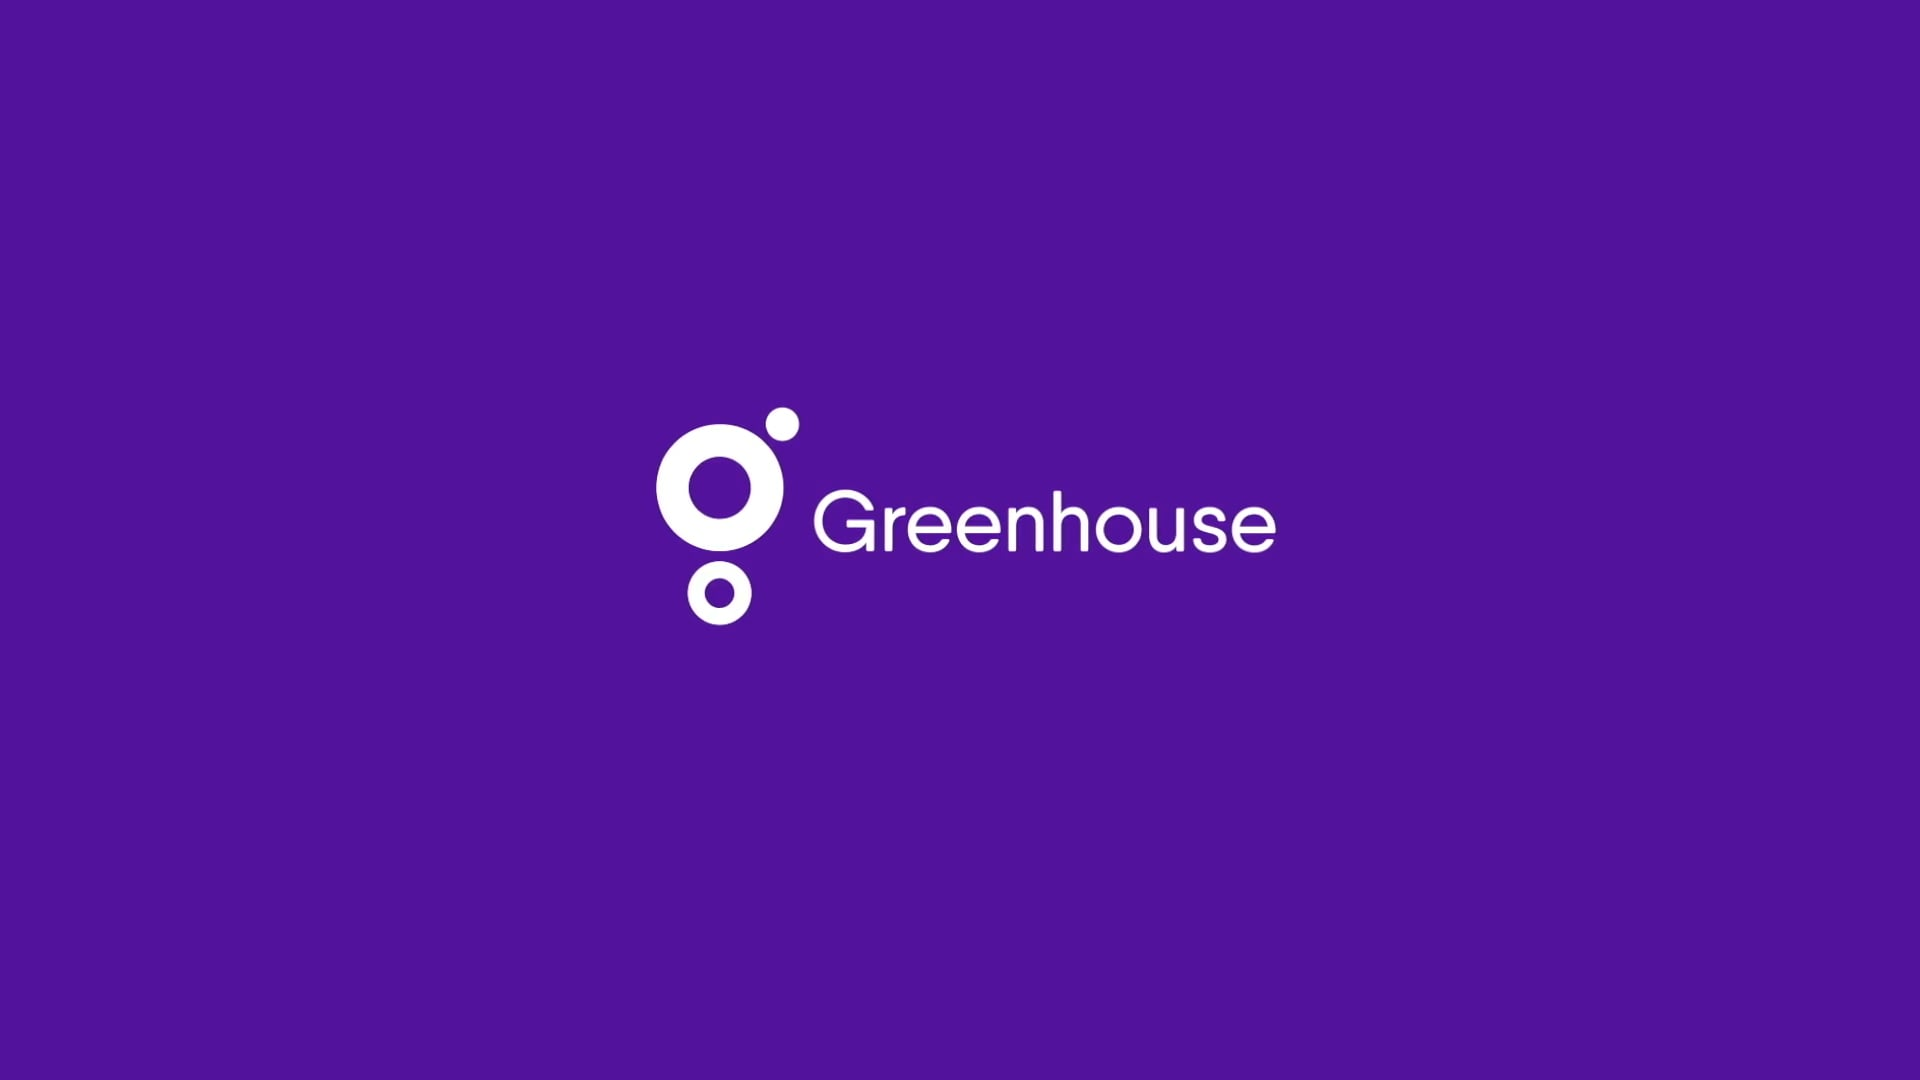 GREENHOUSEWKND19